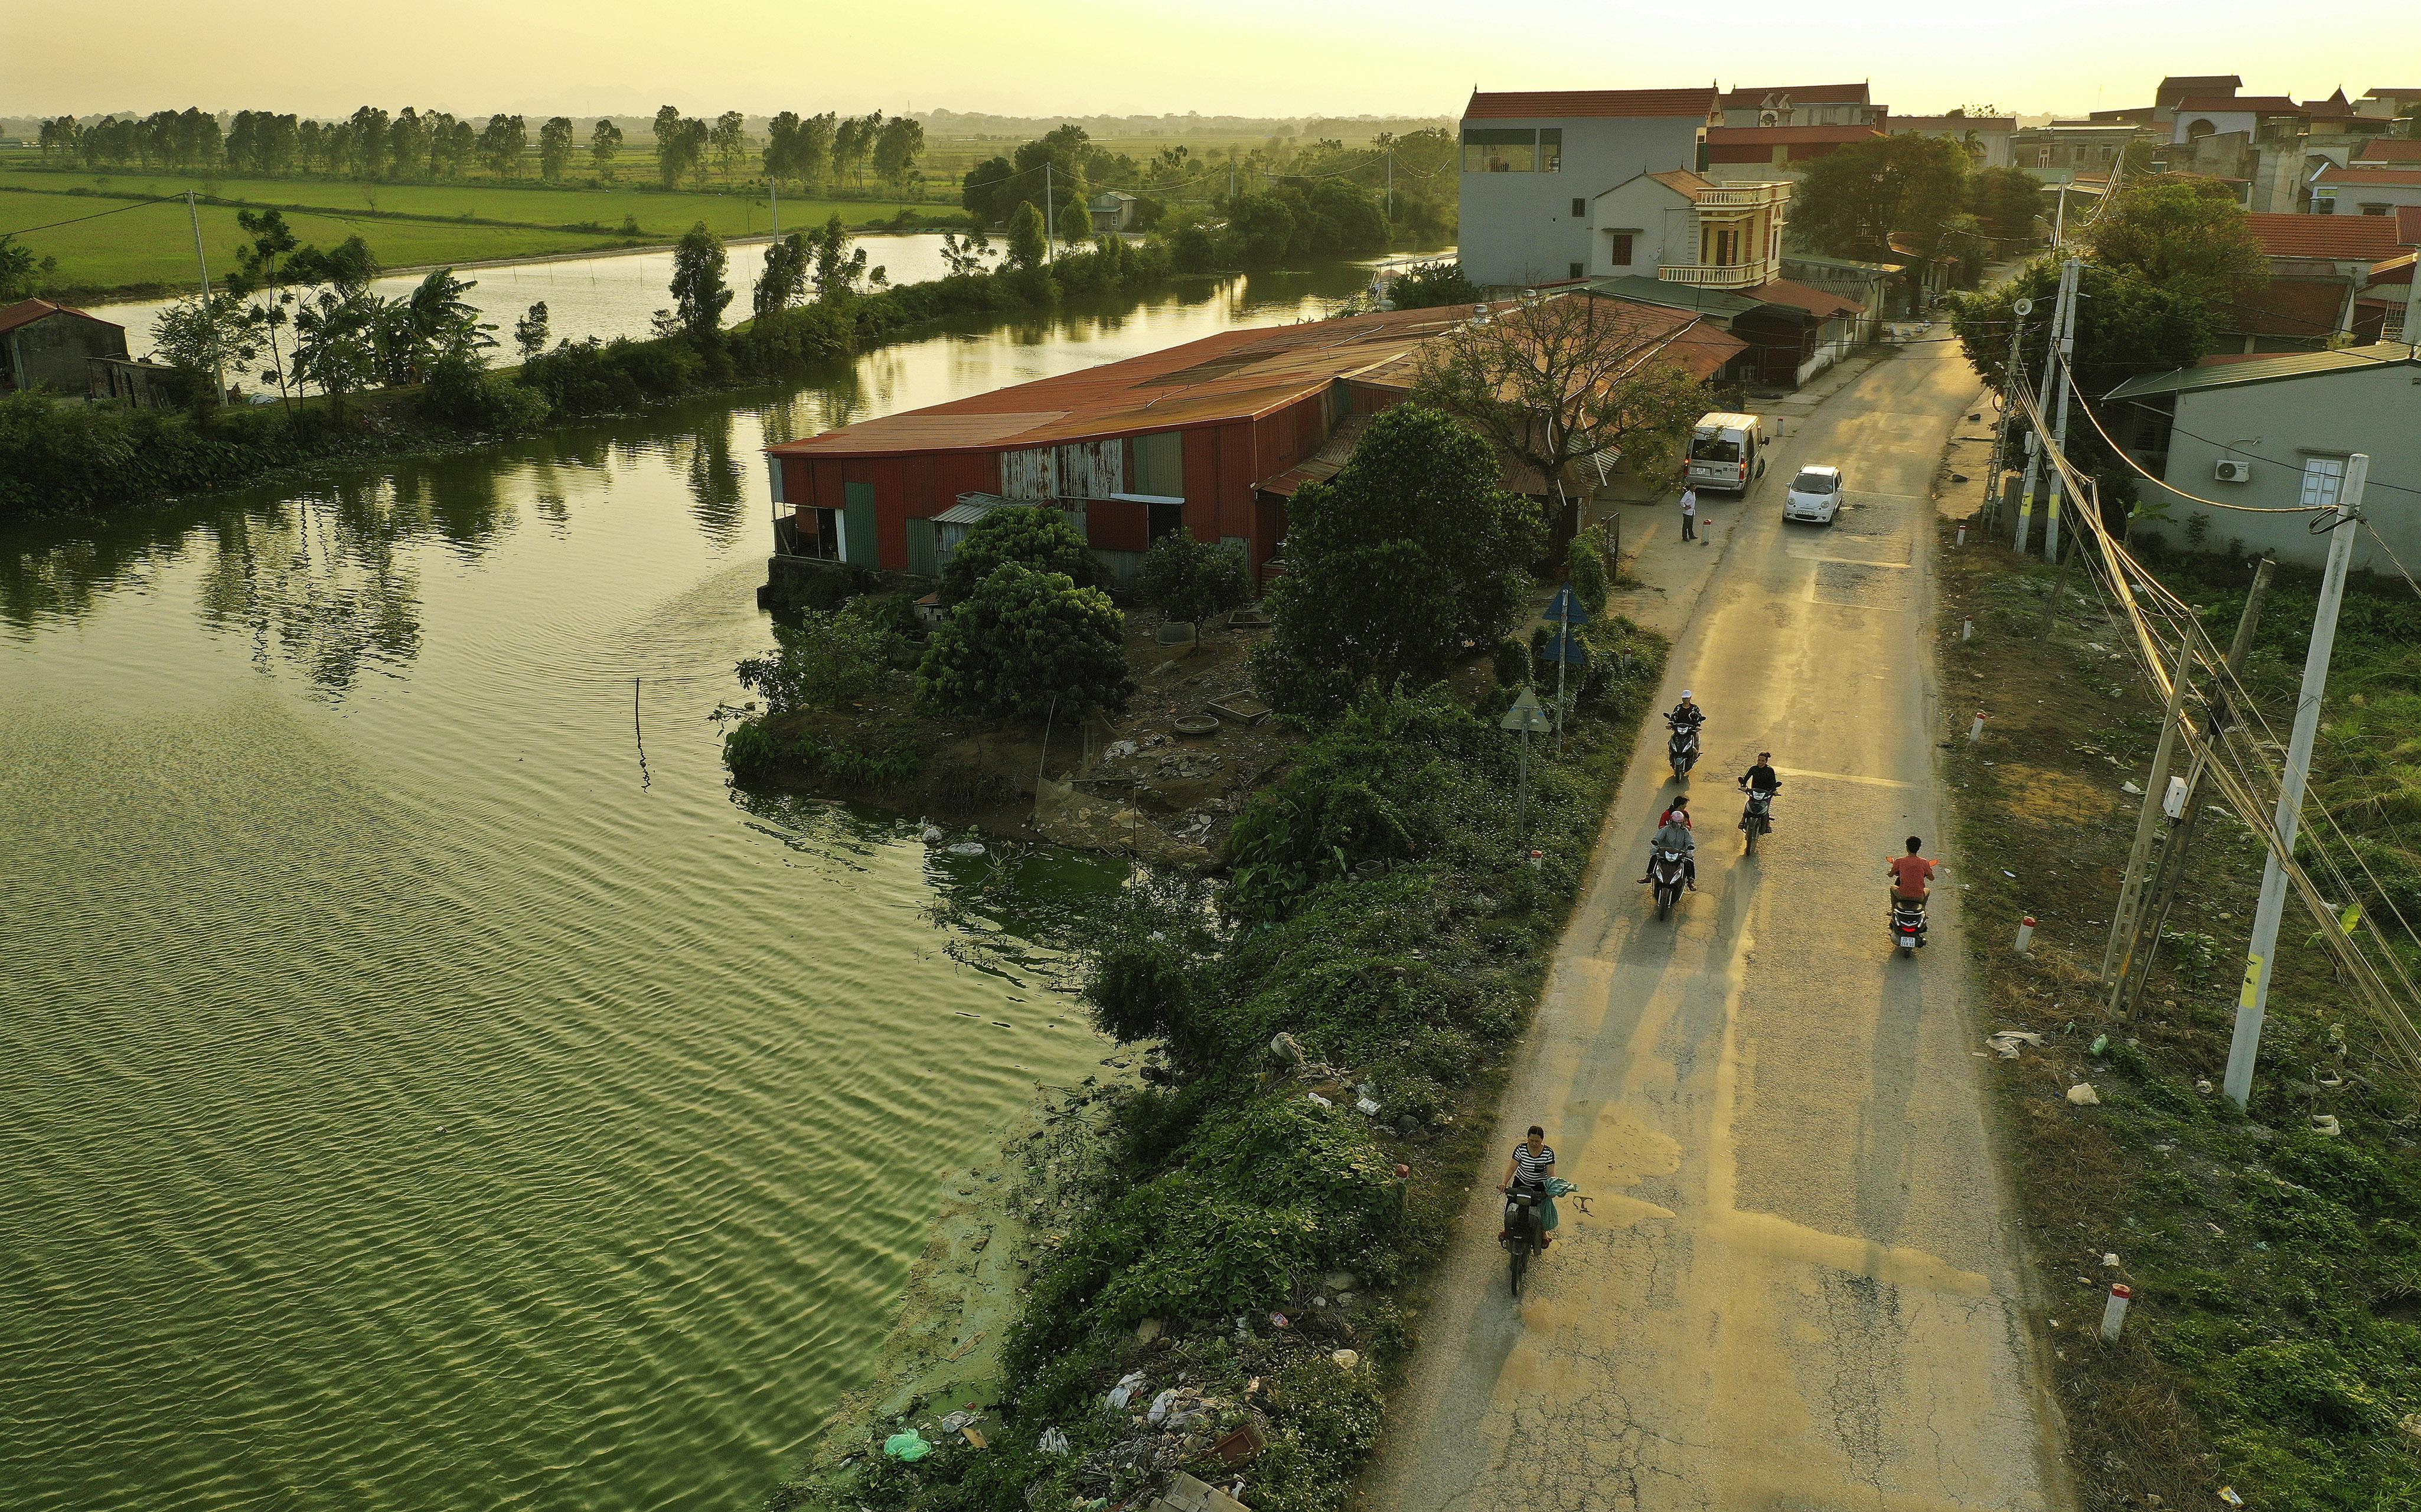 Motorists travel near the water in Hanoi, Vietnam, on Saturday, Nov. 16, 2019.